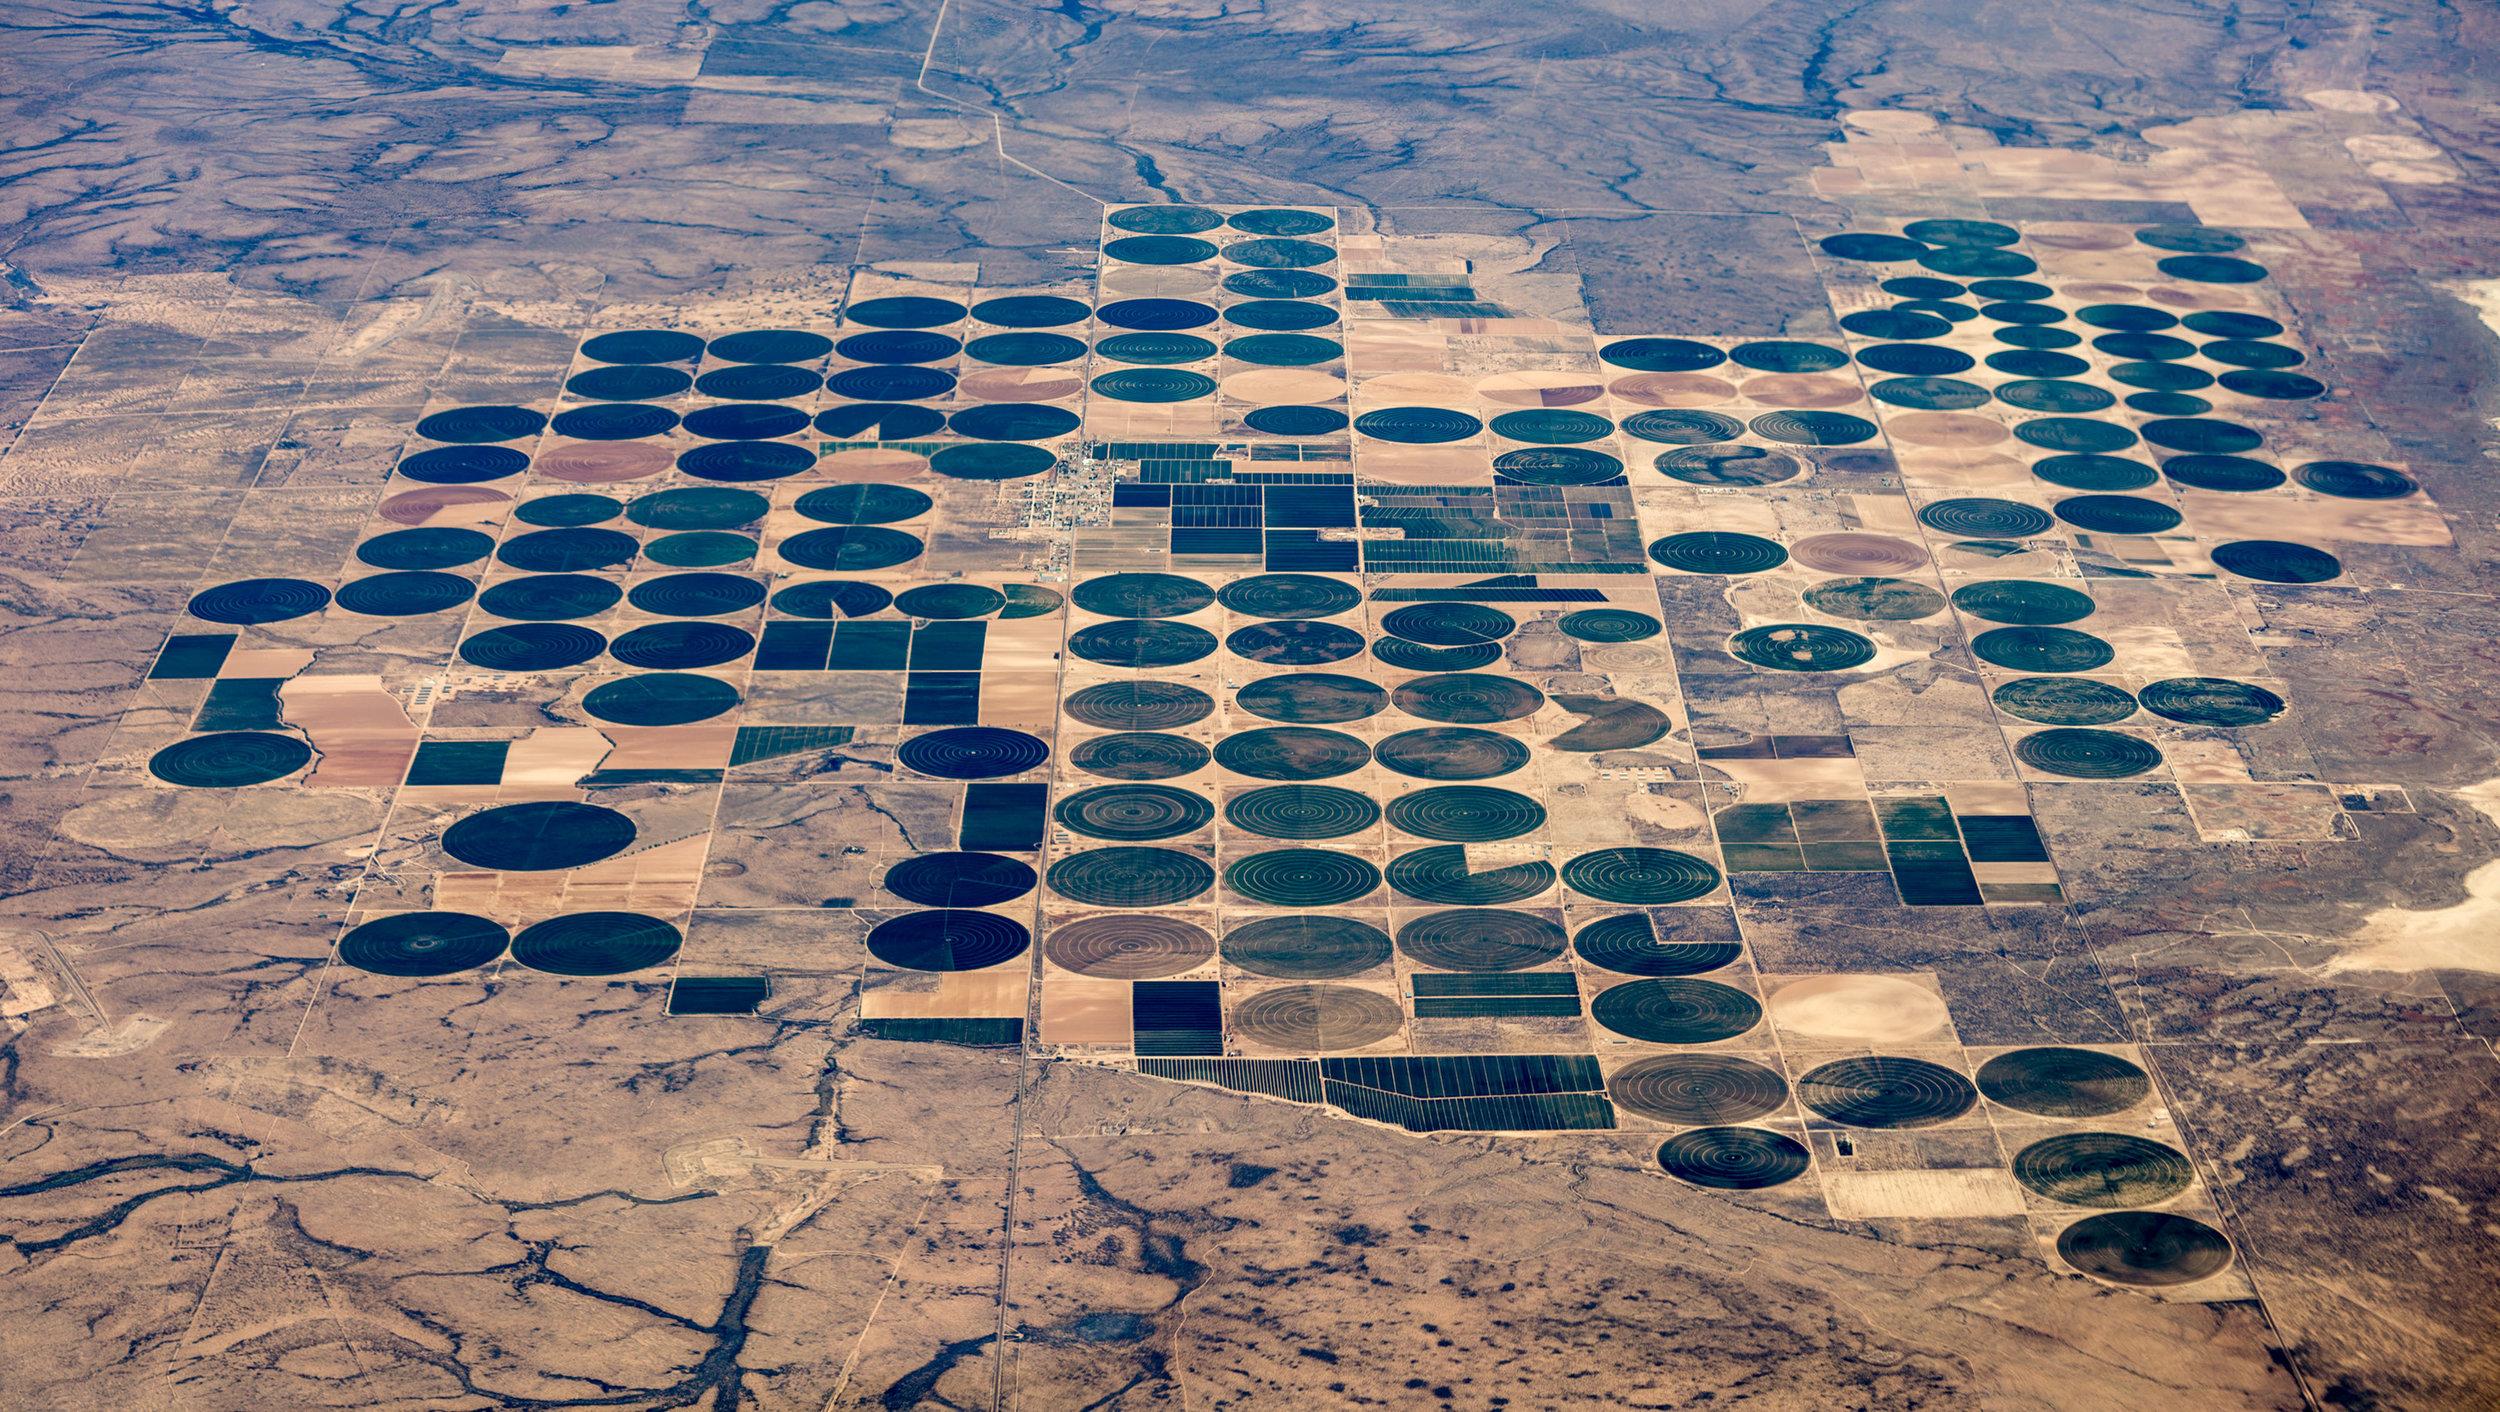 40,000 acres center-pivot aquifer irrigation at Dell City, Texas